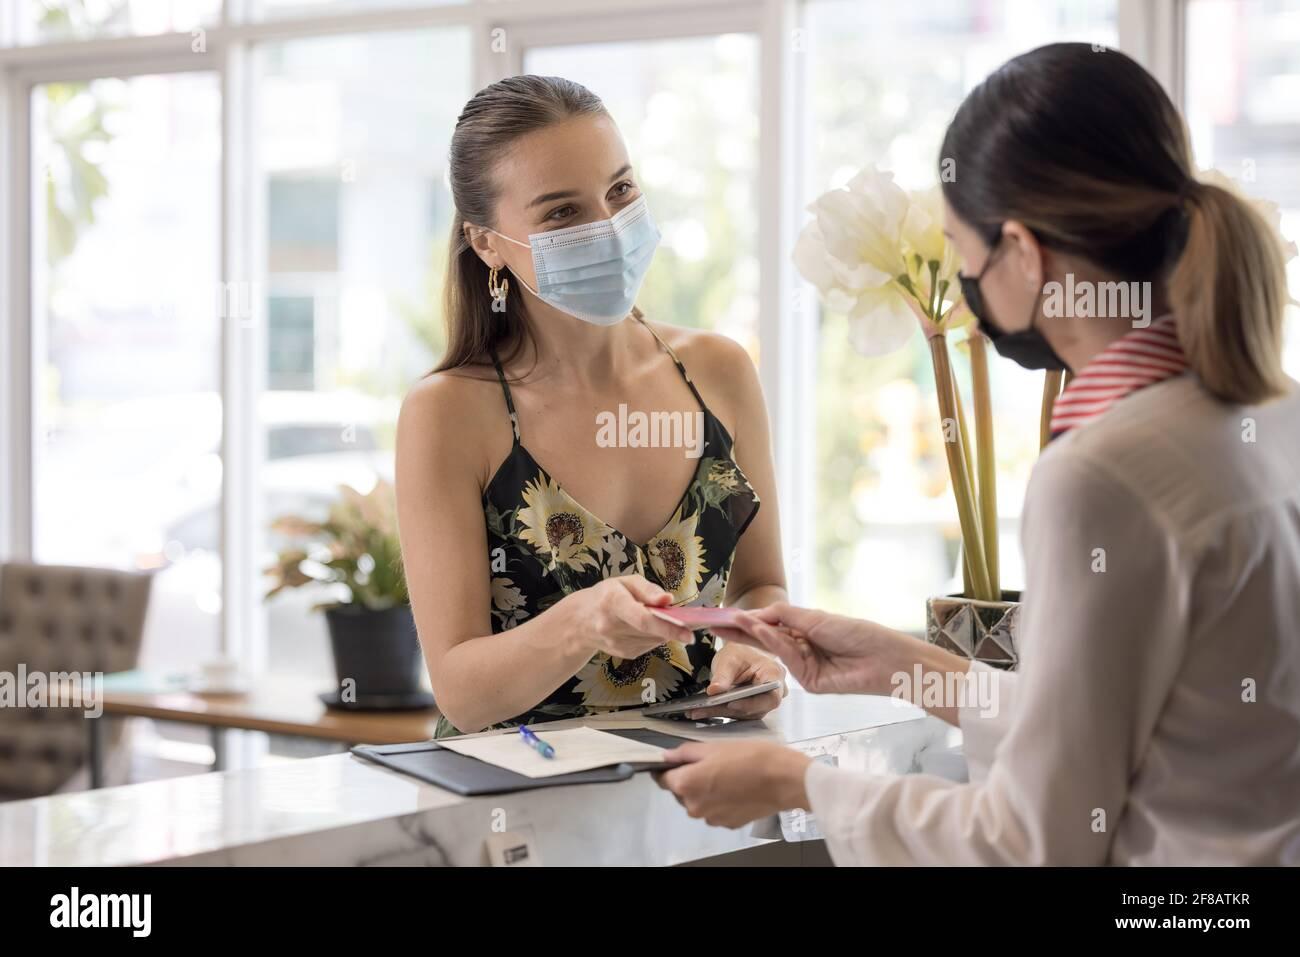 La recepcionista entrega un pasaporte a un turista en te recepción y recepción de un albergue Foto de stock